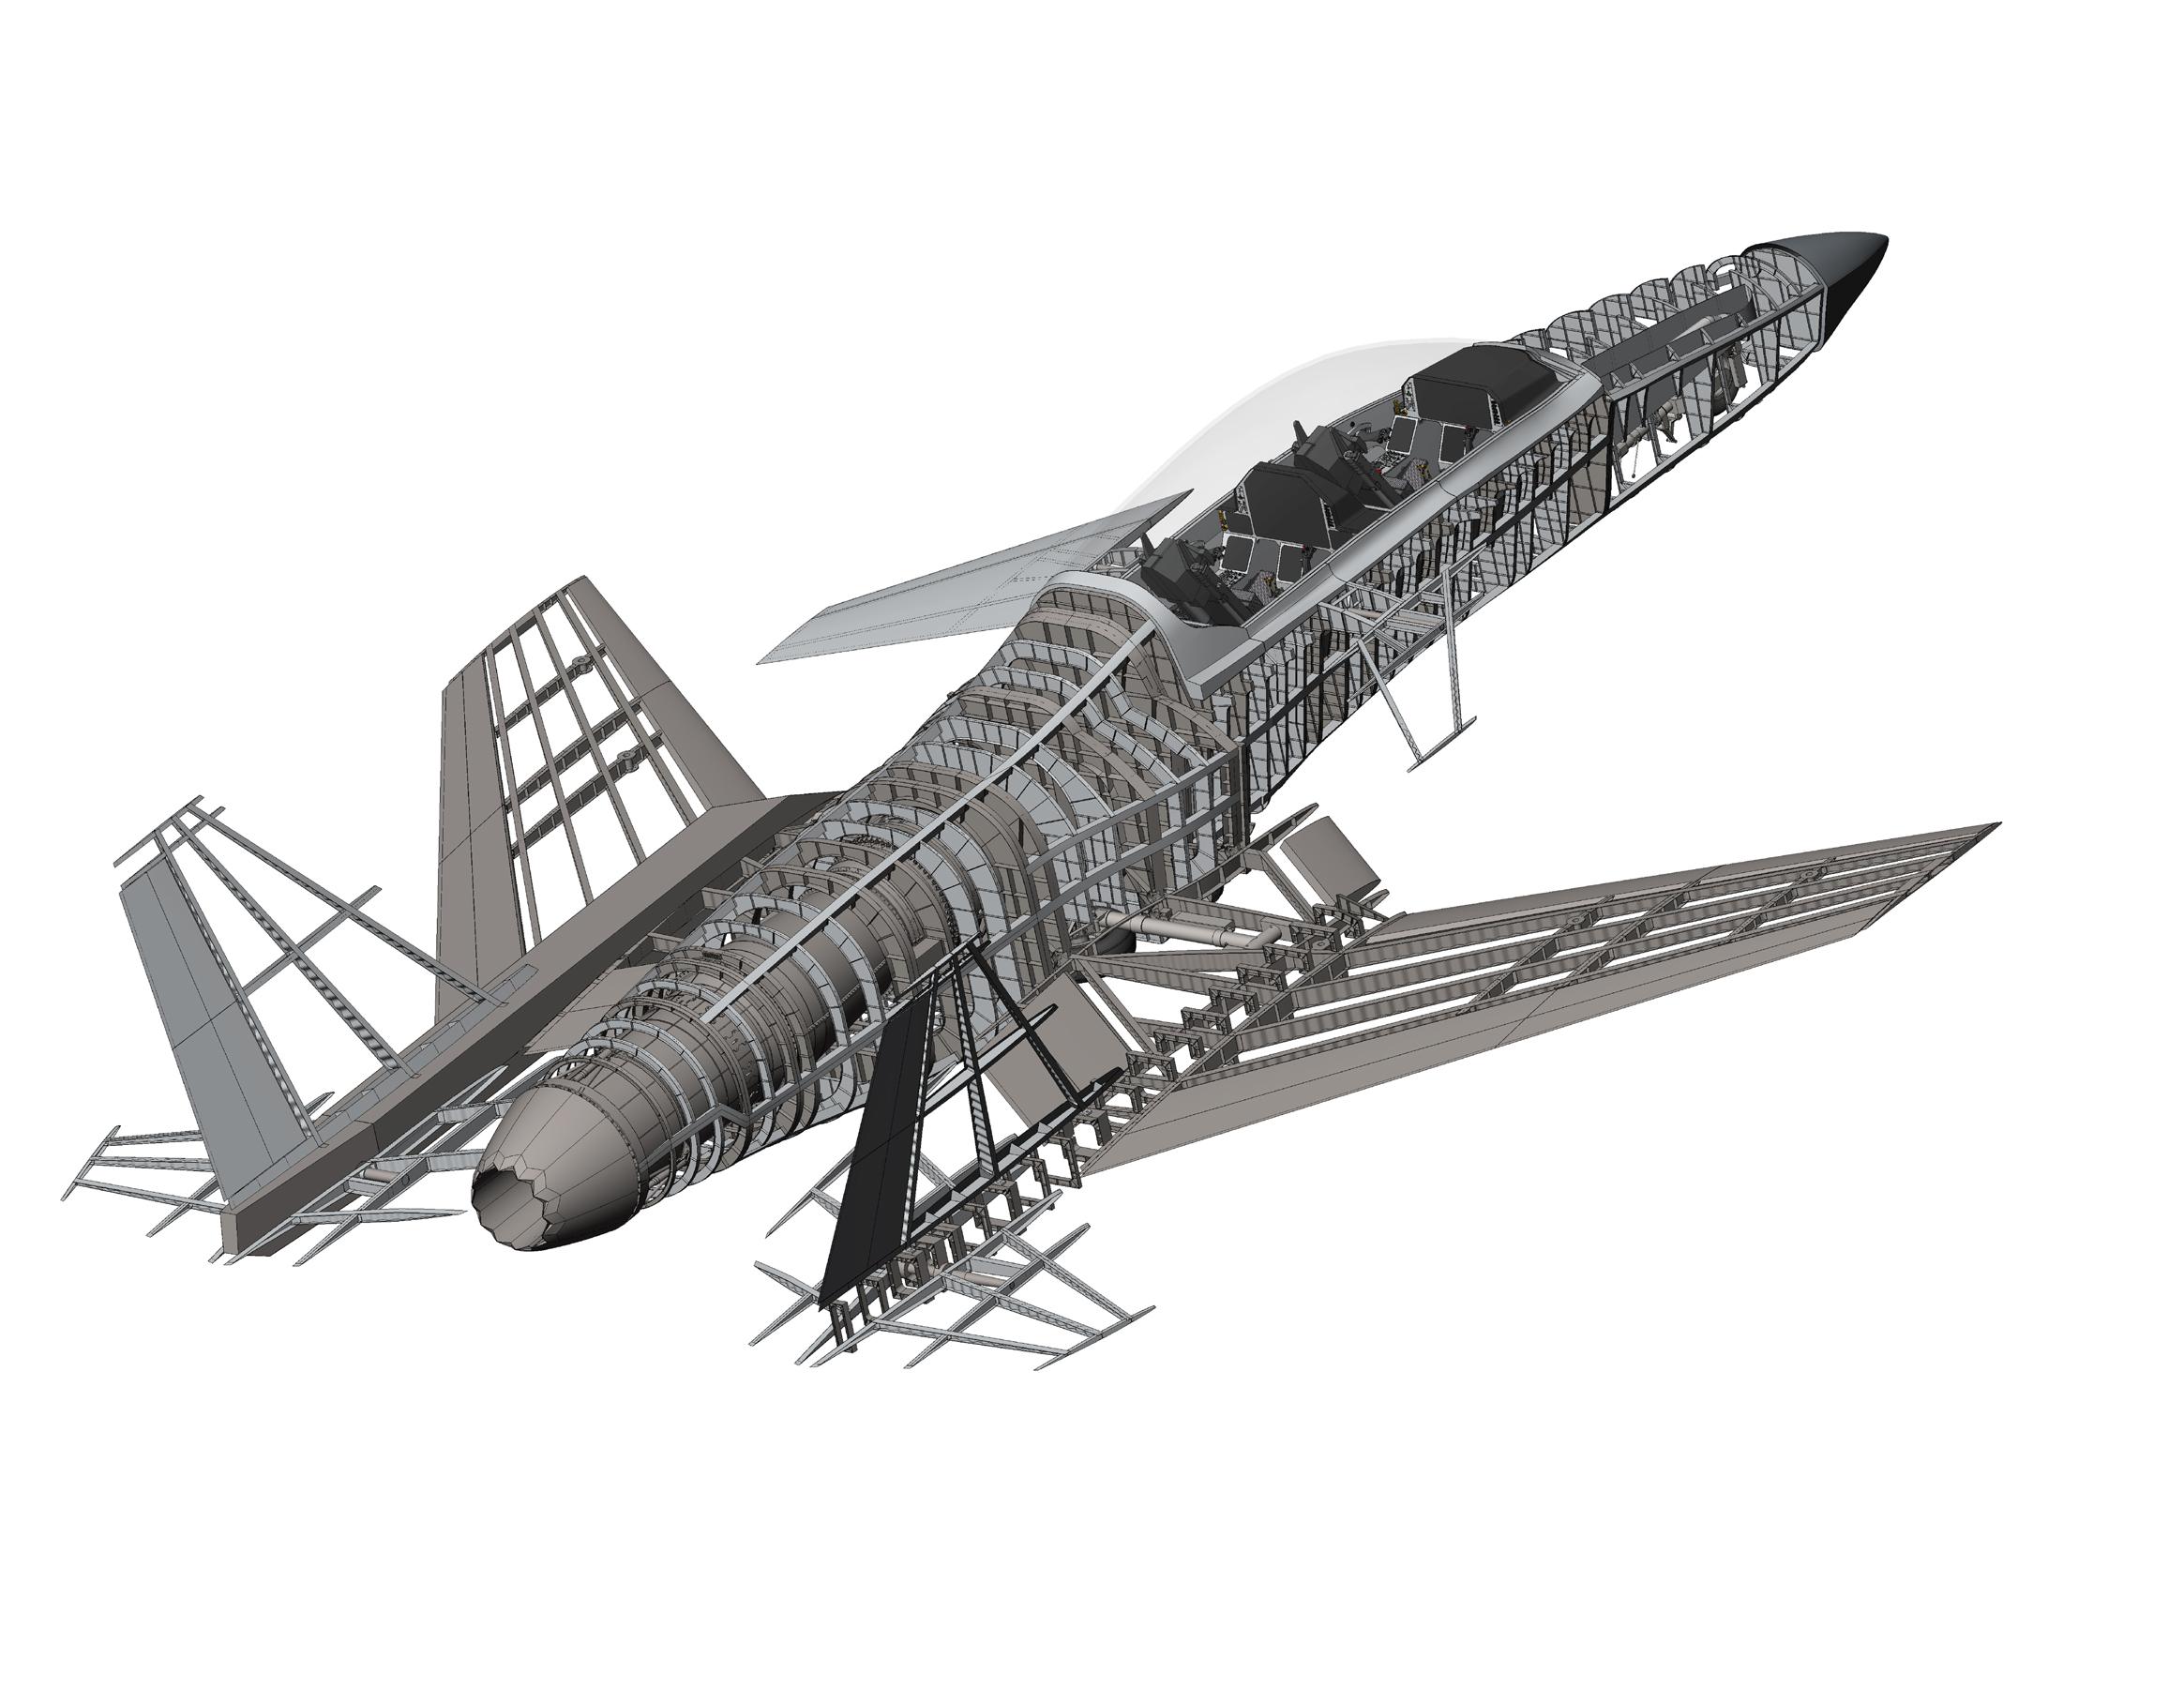 Stavatti, Stavatti Aerospace, SM-47, Super Machete, T-X